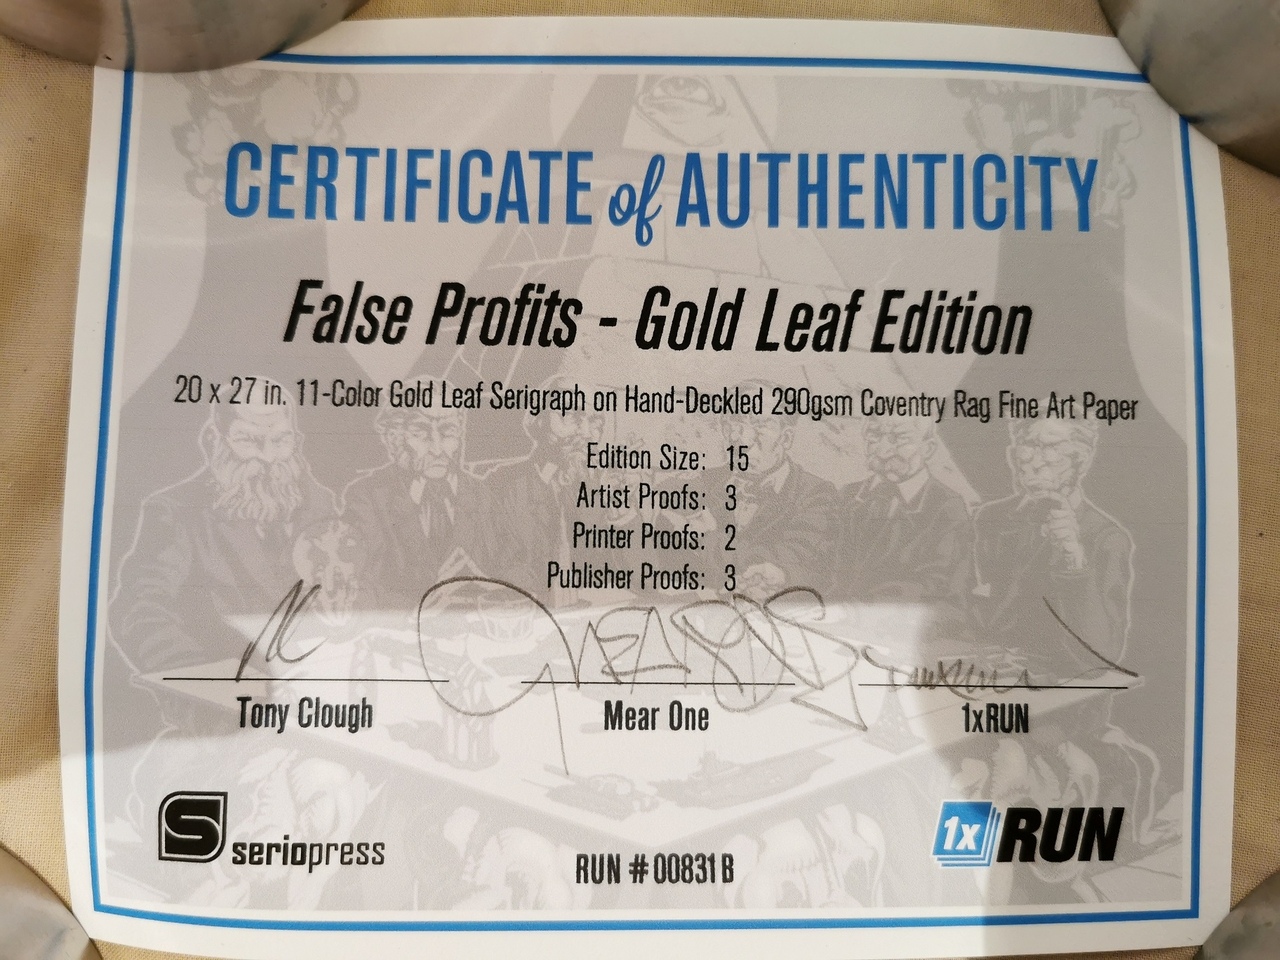 Gold leaf false profits certificate